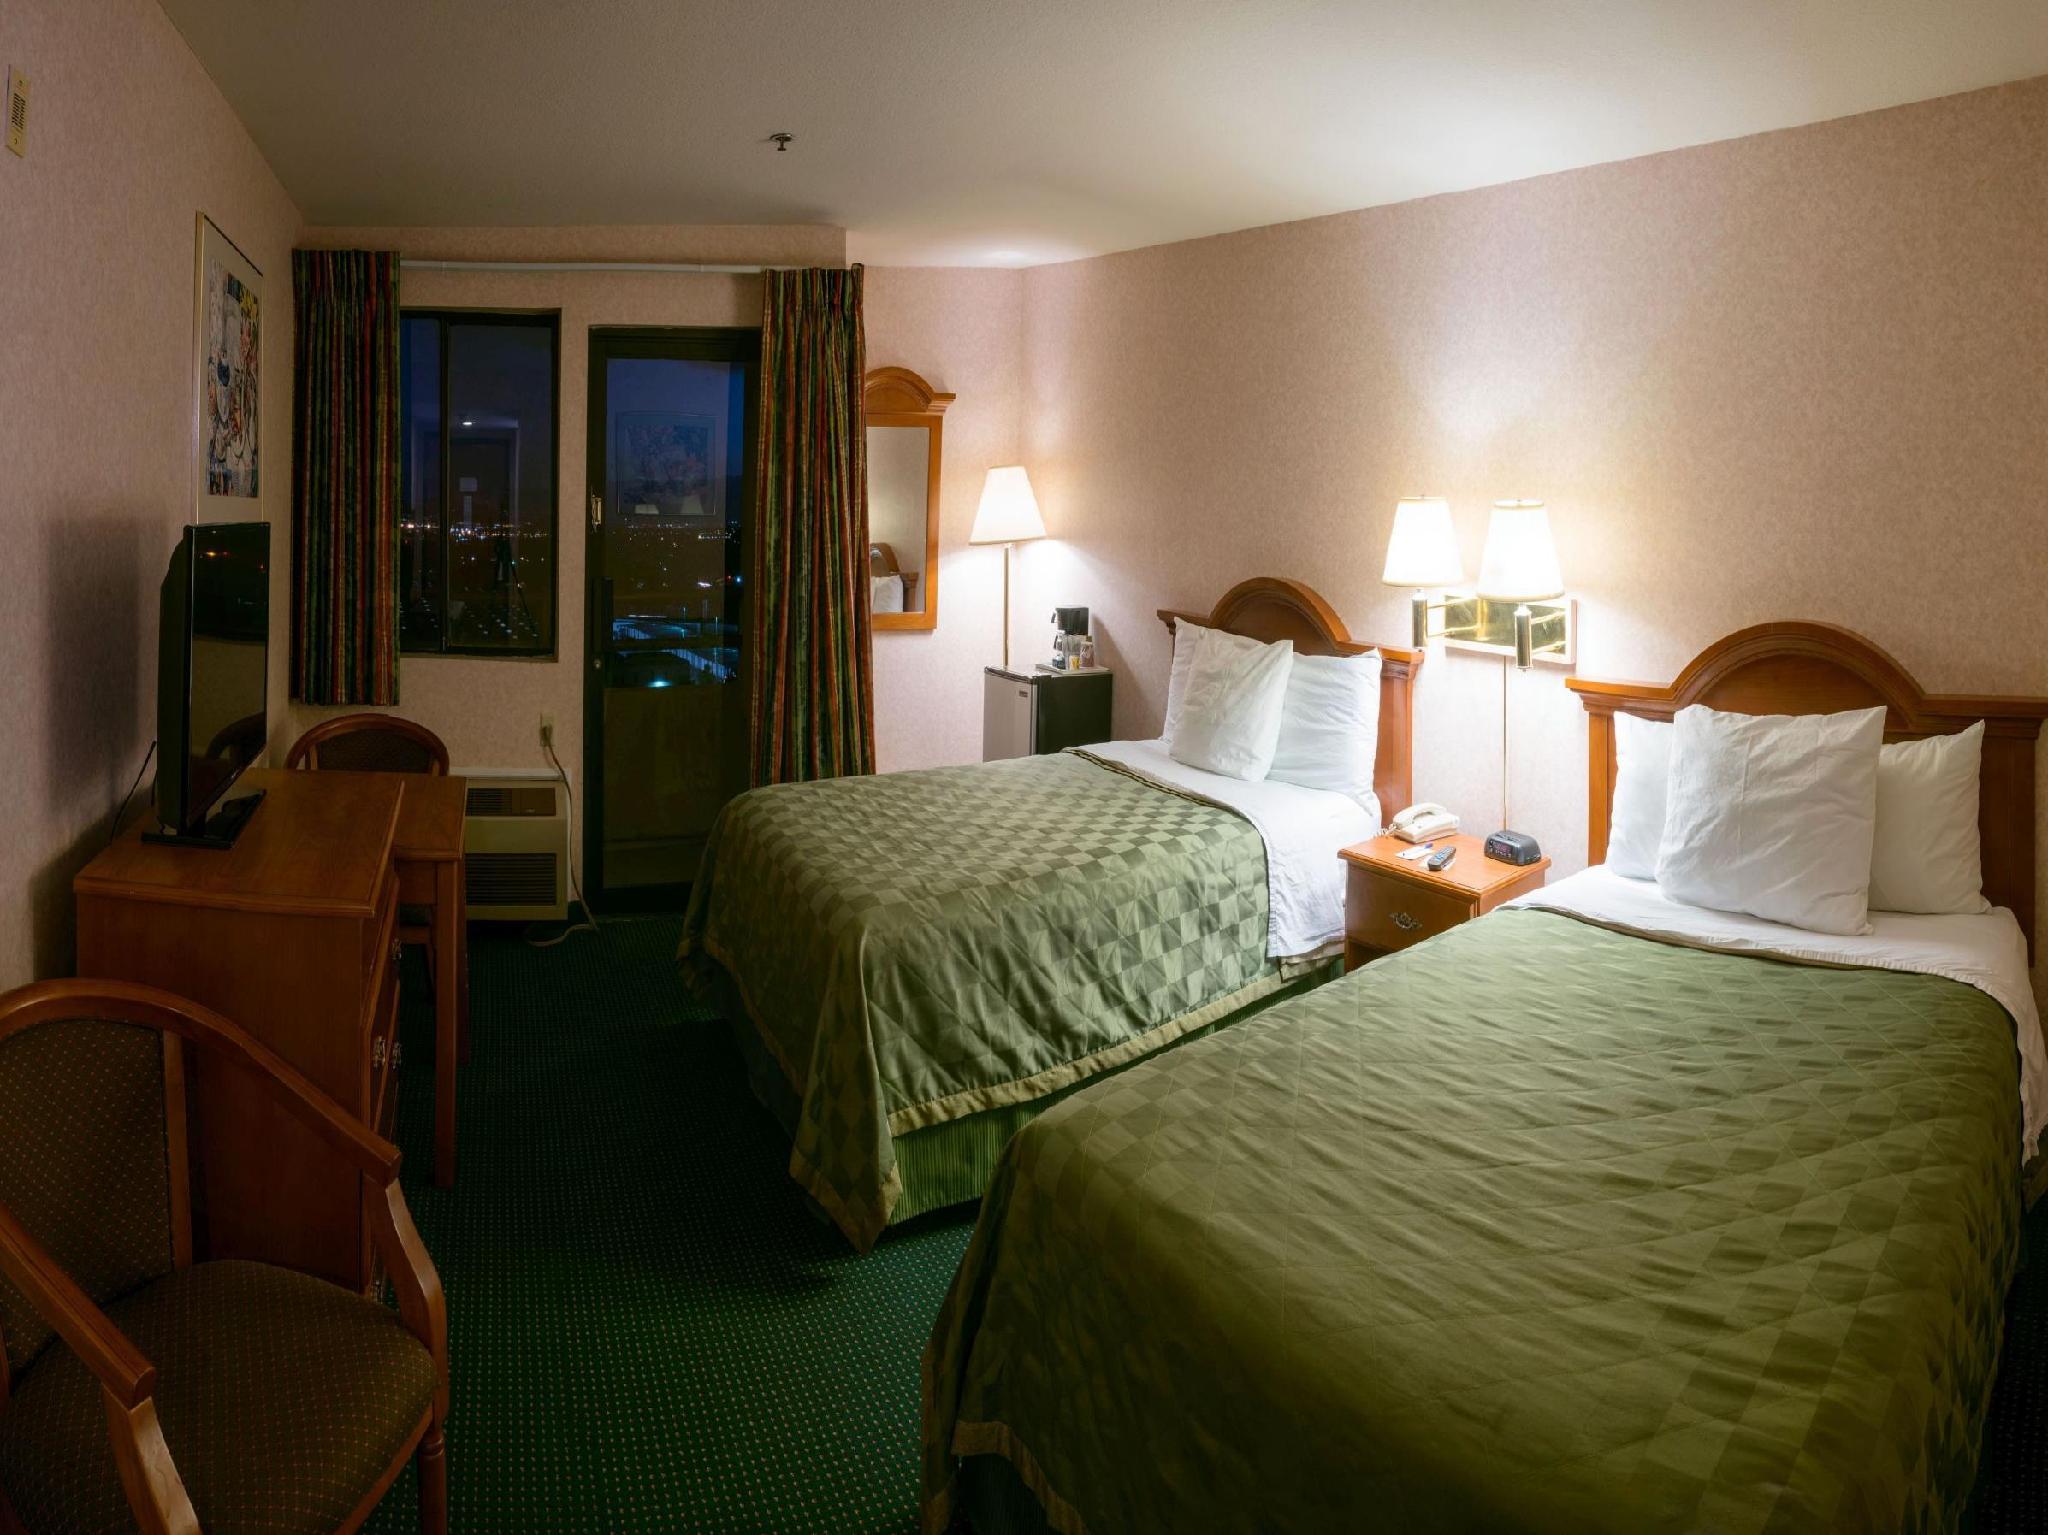 2 Double Beds Smoking Hills Garden Hotel San Bernardino